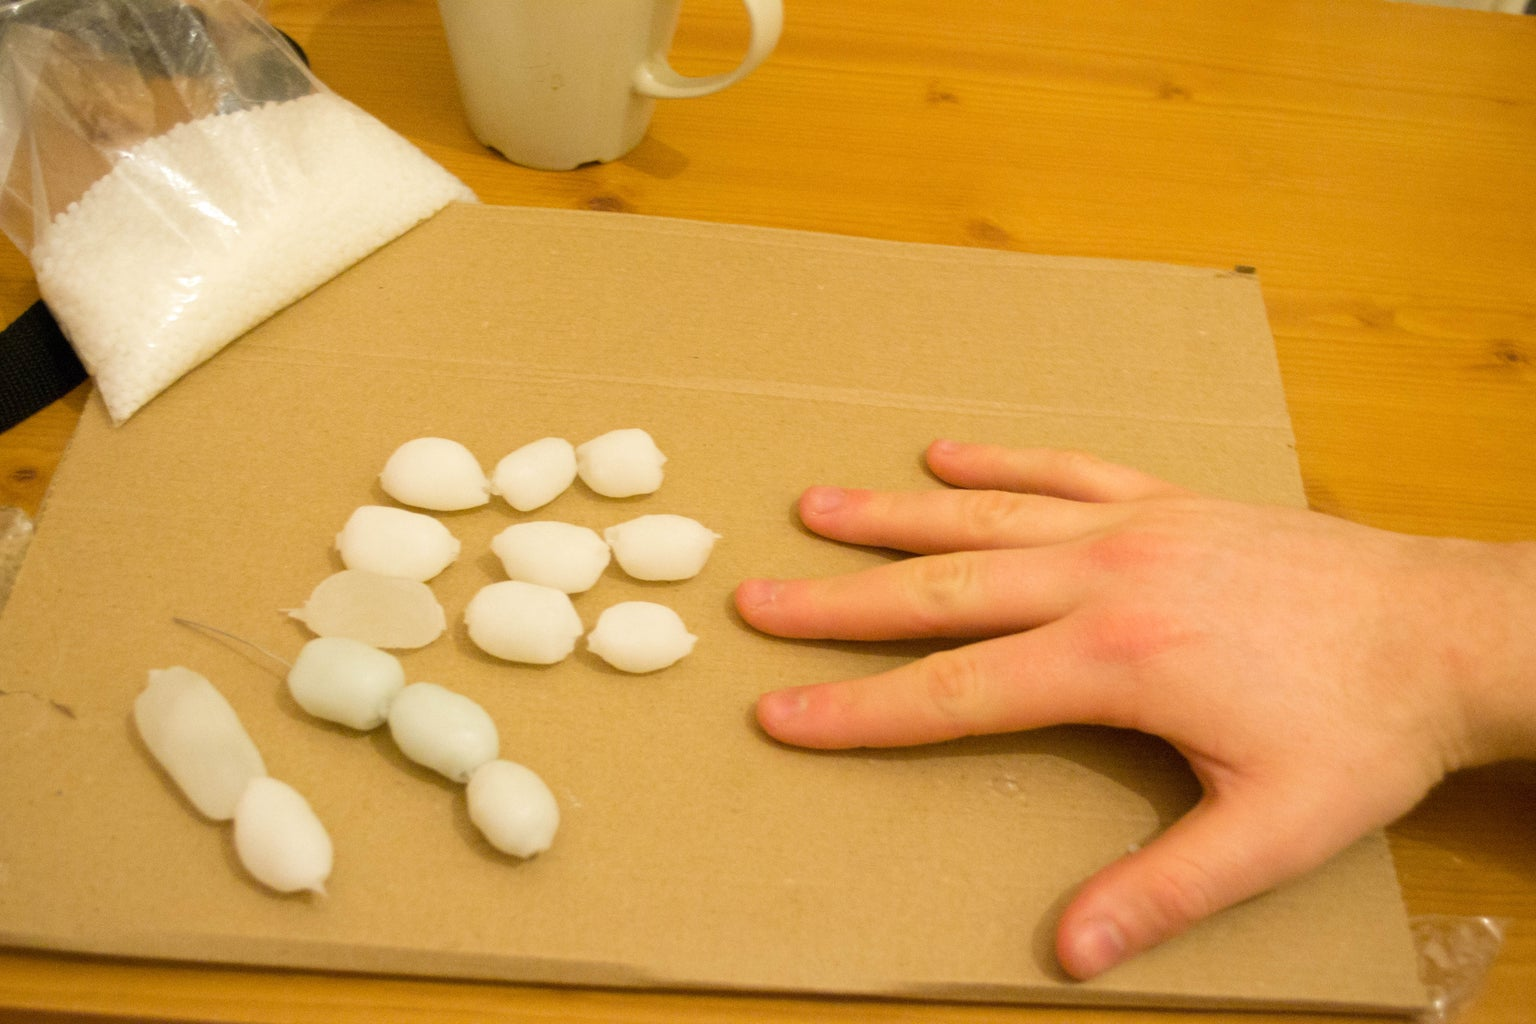 Simple Polymorph Hand: Make the Finger Bones